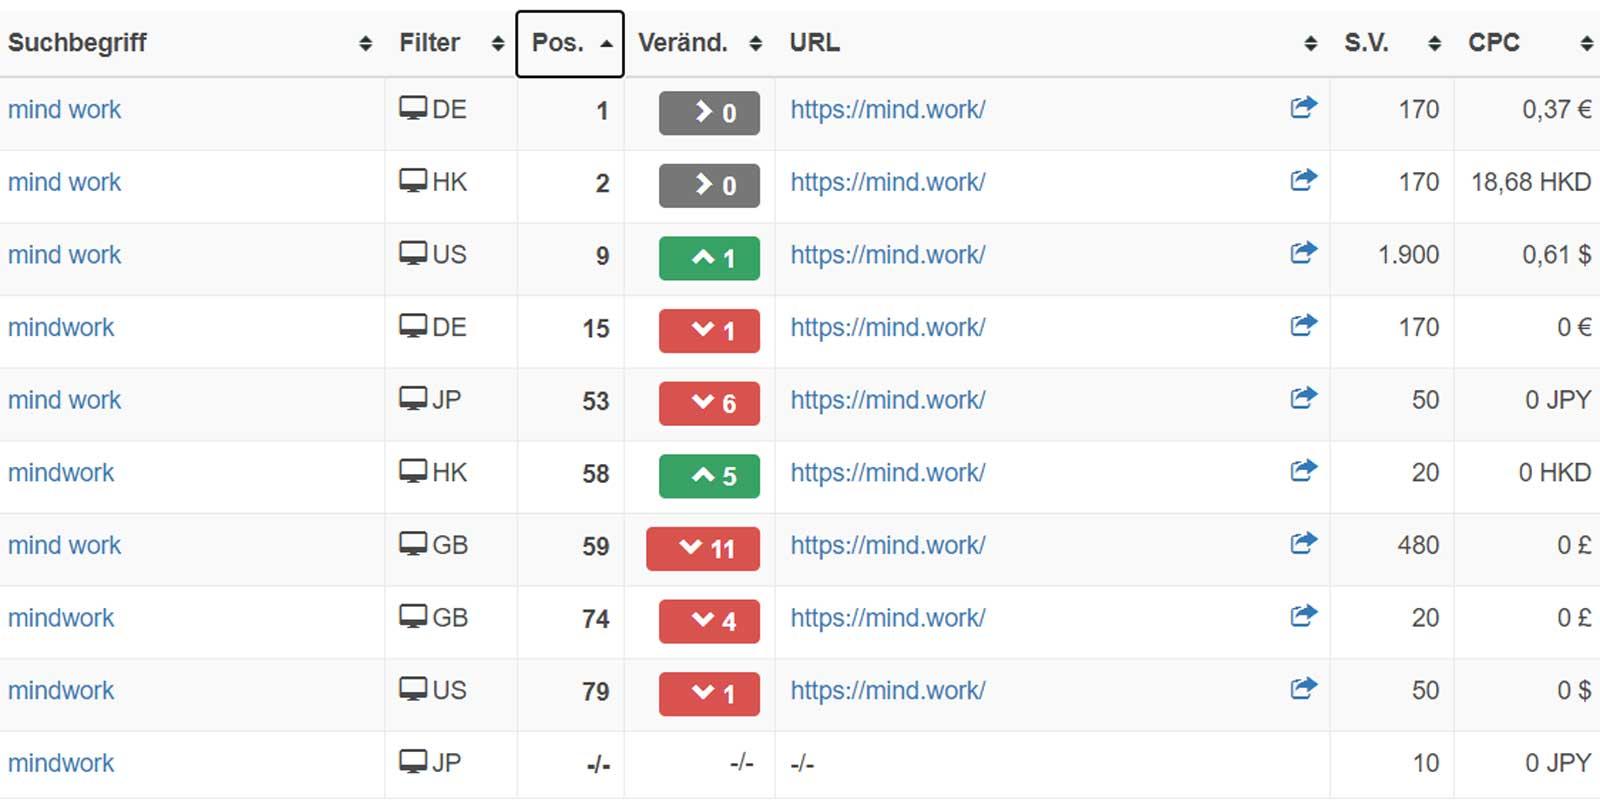 mind work google search ranking